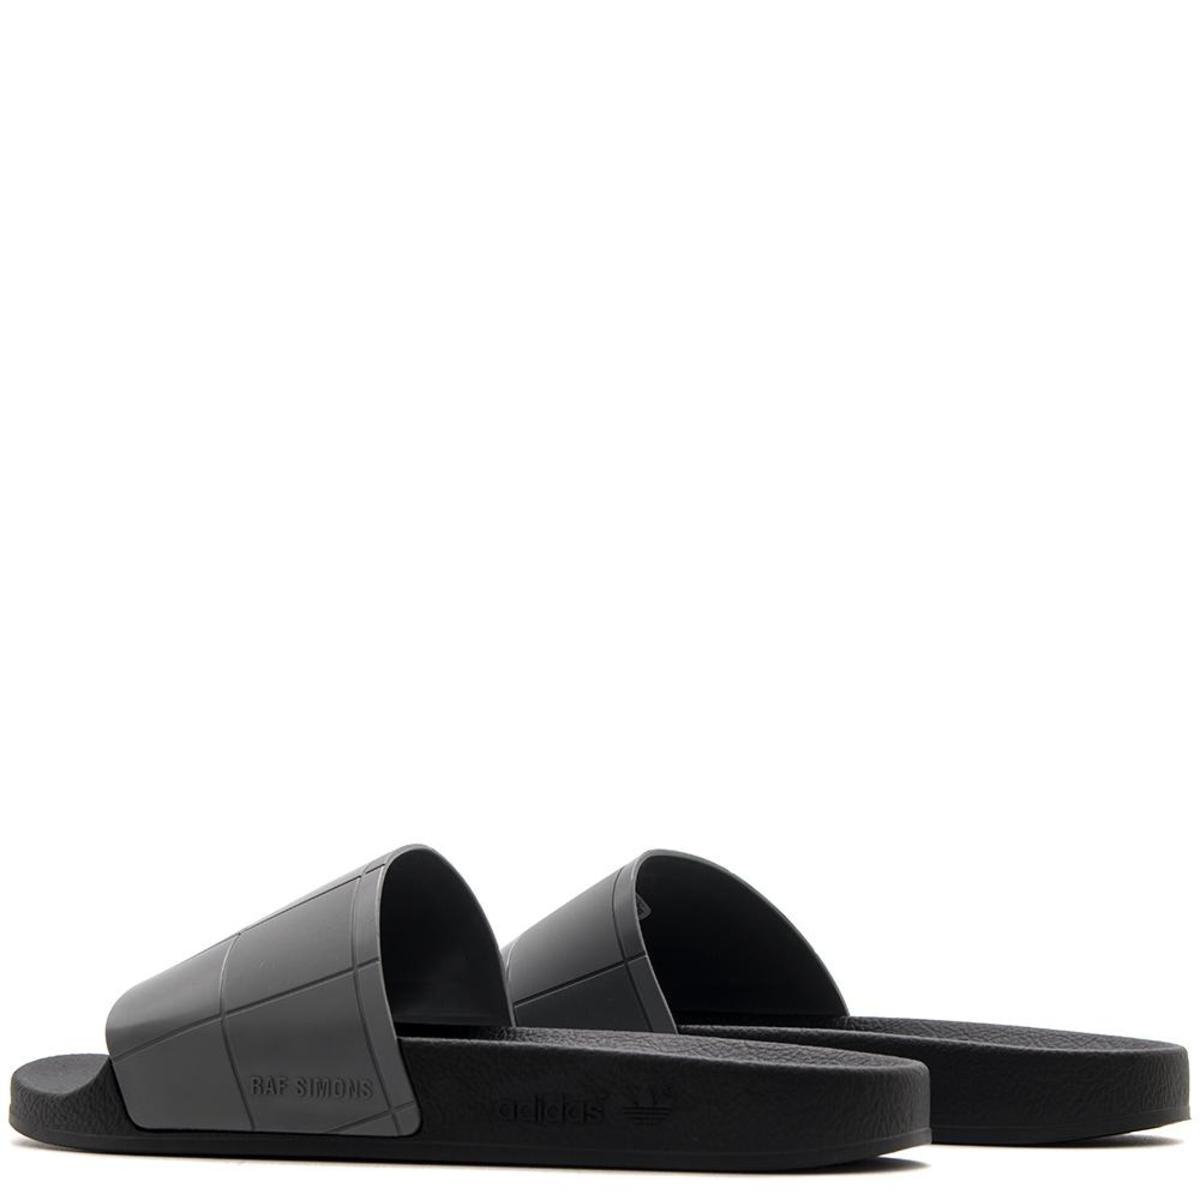 e9549c827b89 Adidas by Raf Simons Adilette Checkerboard Sandals - Core Black ...